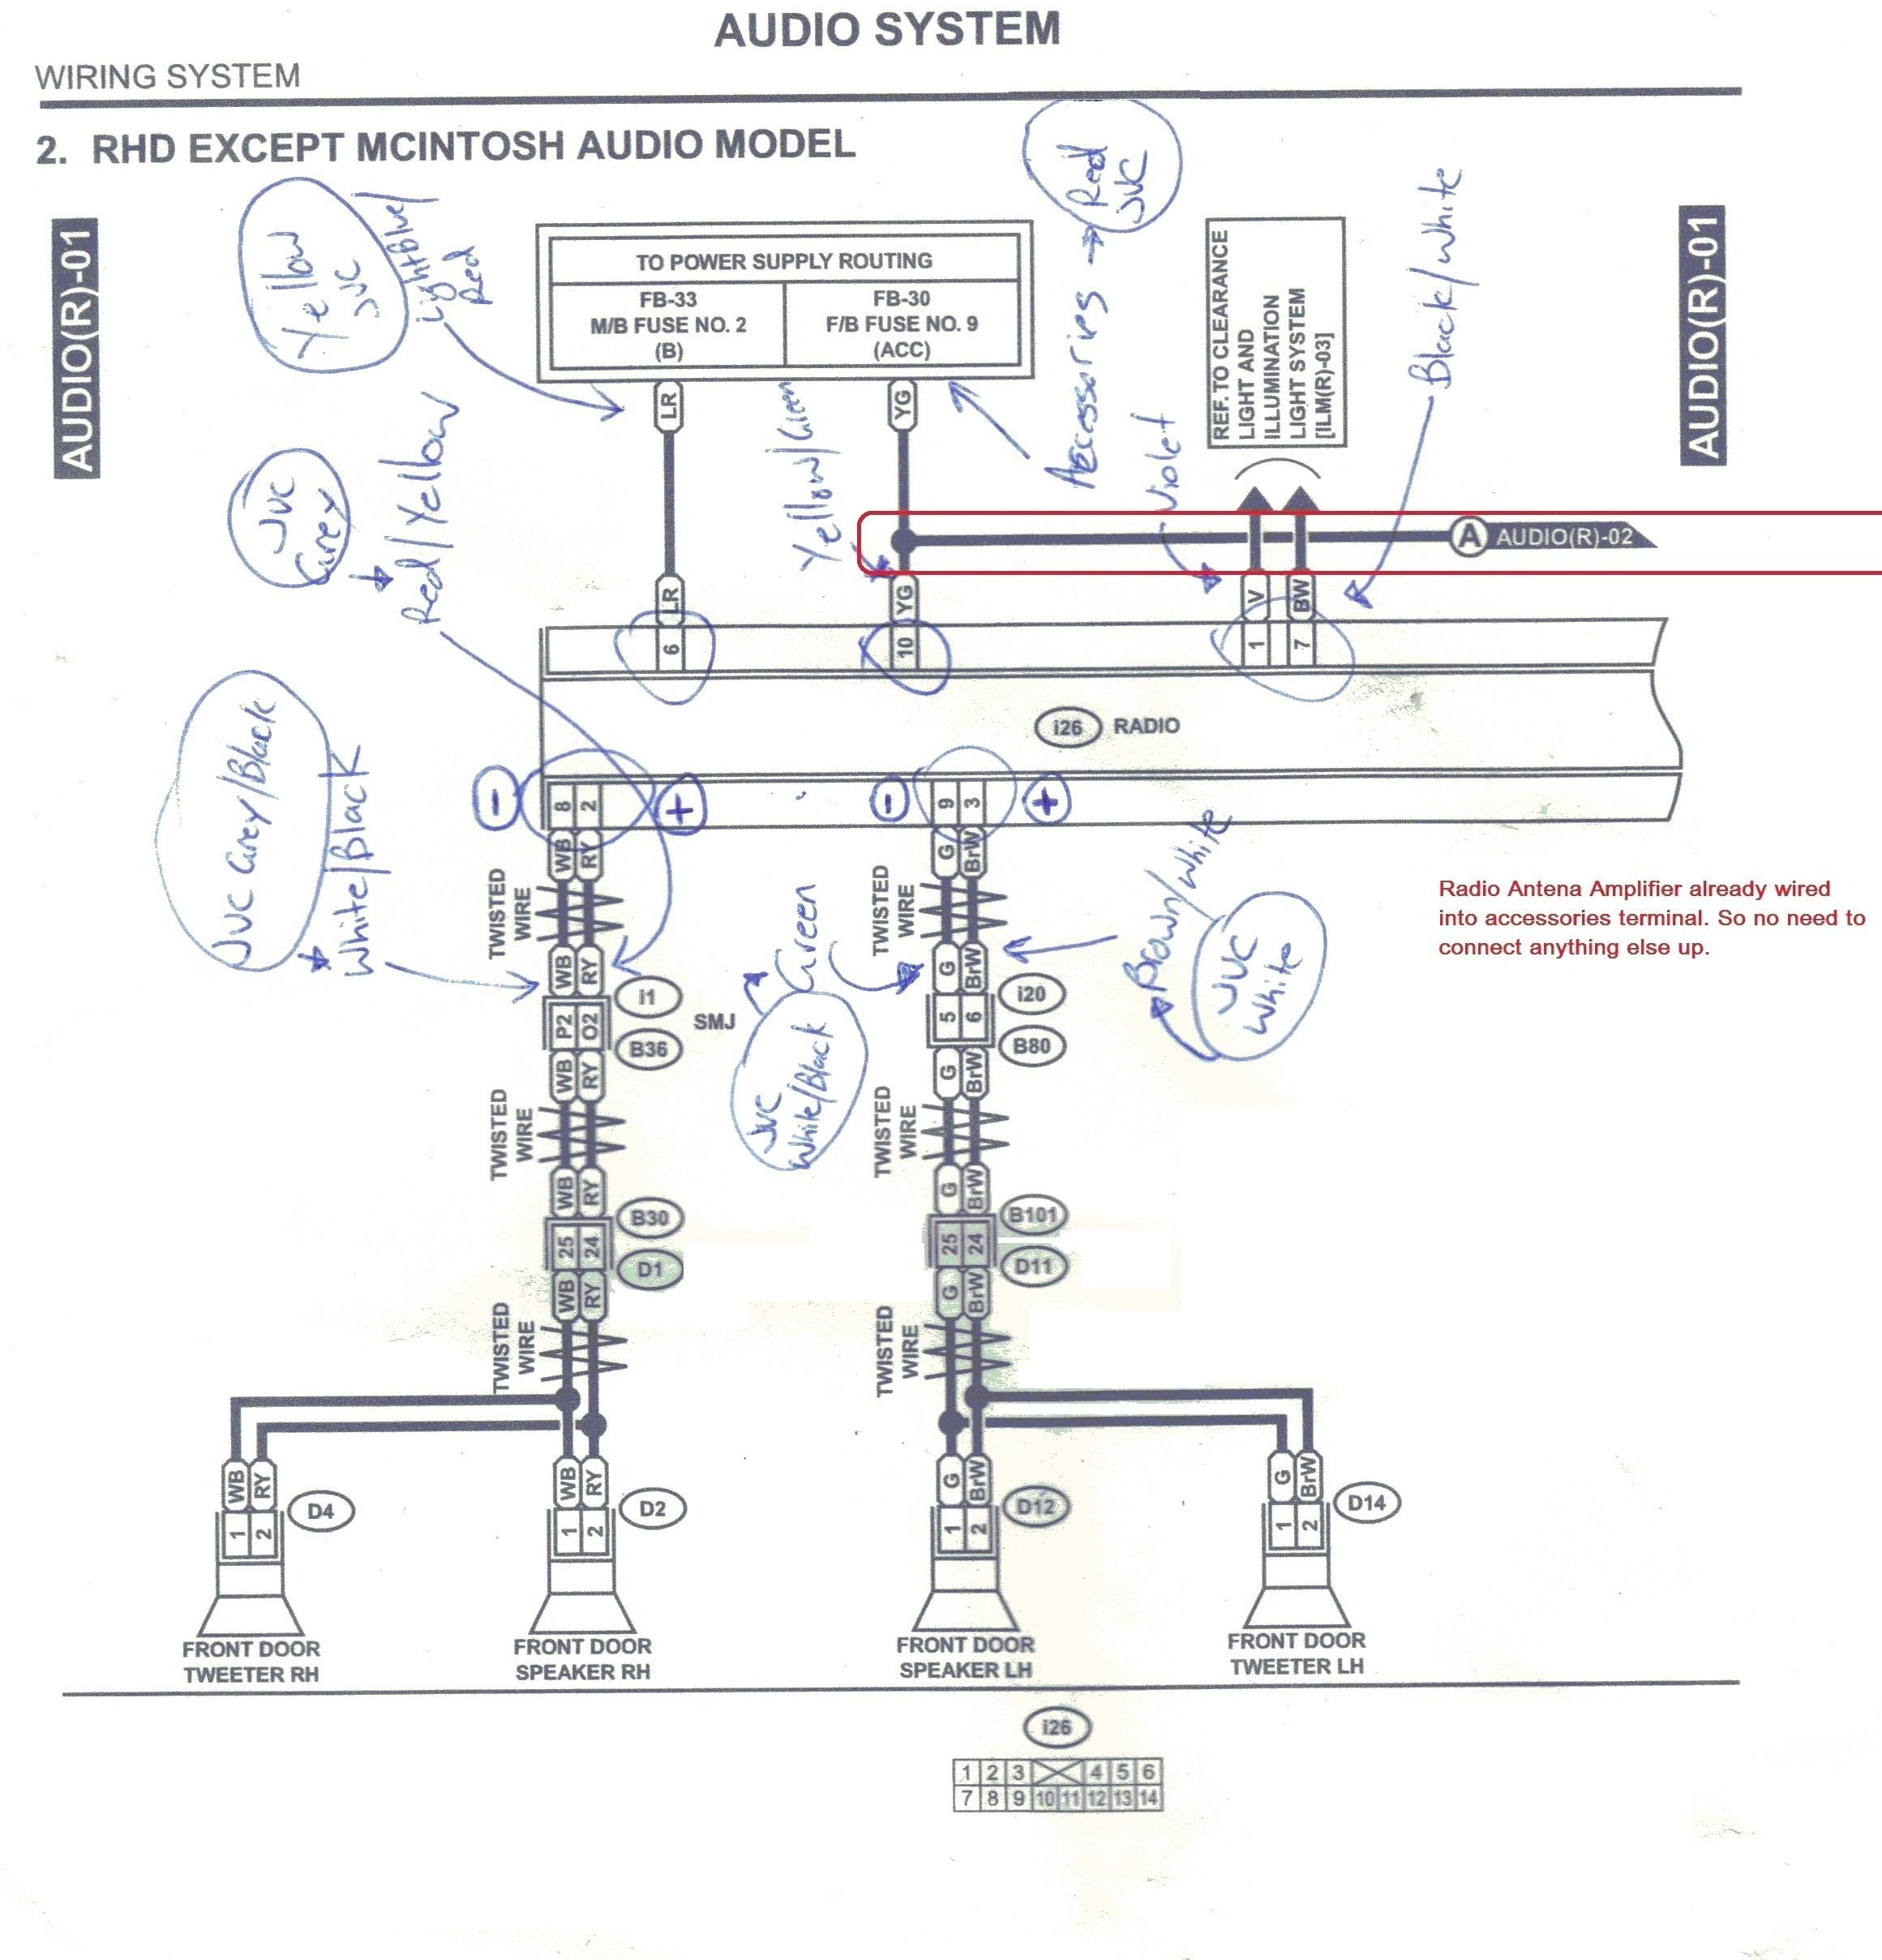 subaru horn wiring diagram subaru mcintosh wiring diagram keju www rundumpodcast de  subaru mcintosh wiring diagram keju